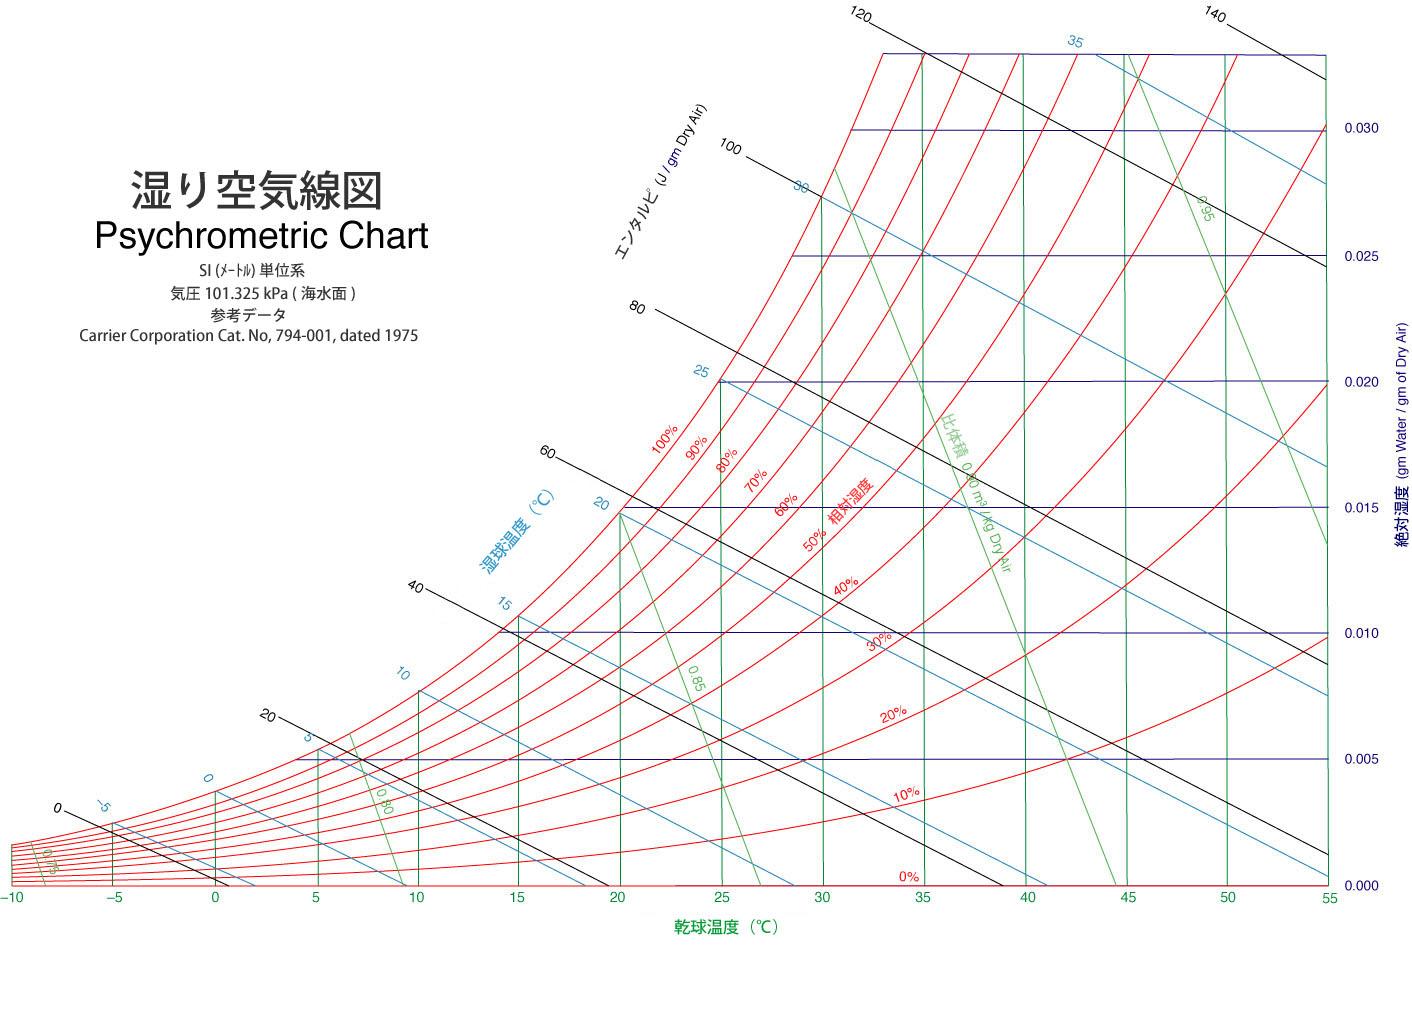 Sea Level Chart: PsychrometricChart-SeaLevel-SI-jpn.jpg - Wikimedia Commons,Chart